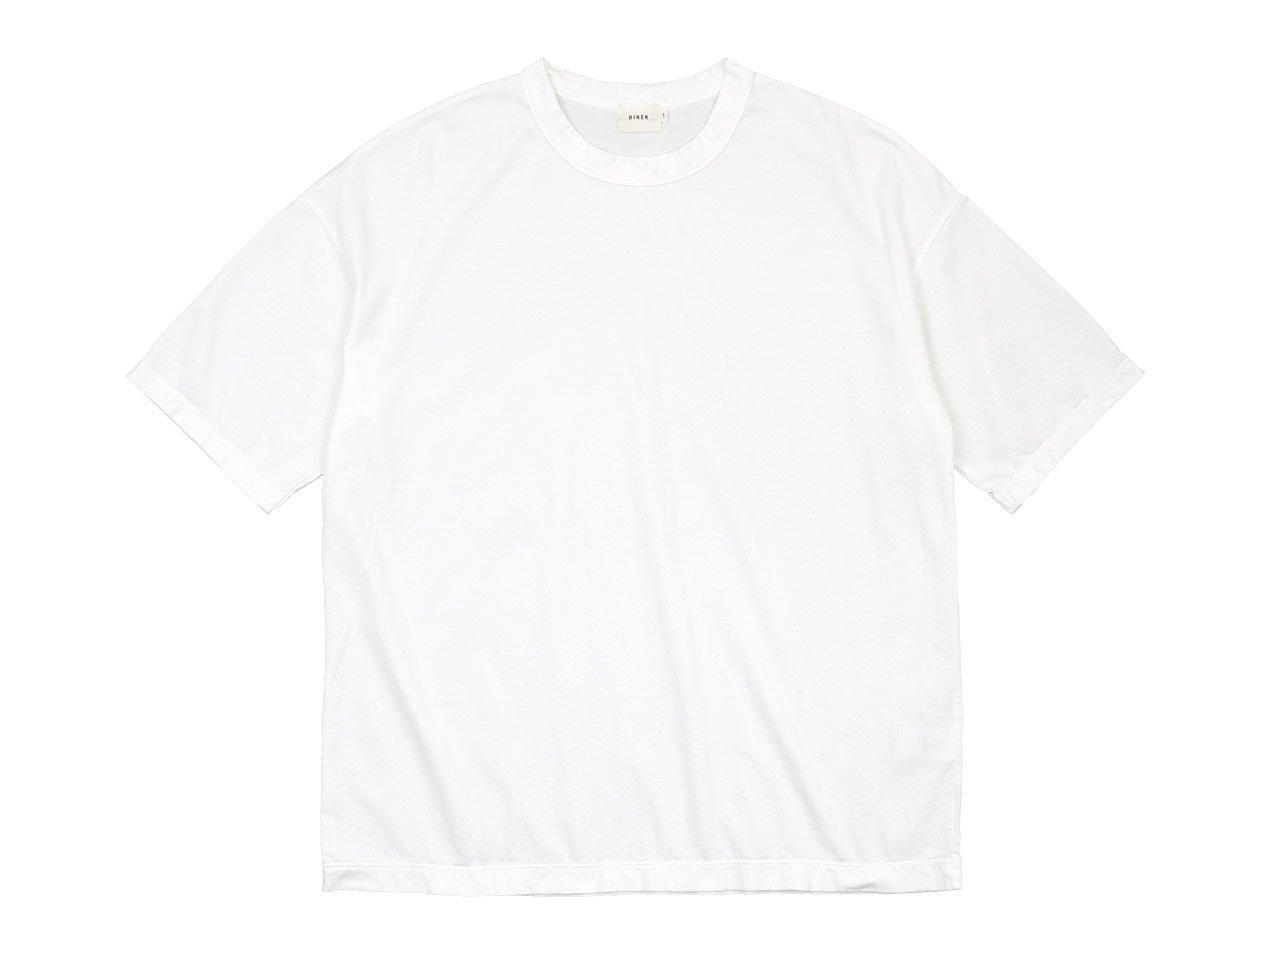 RINEN 60/2天竺 半袖ワイドTシャツ 01ホワイト 〔メンズ〕